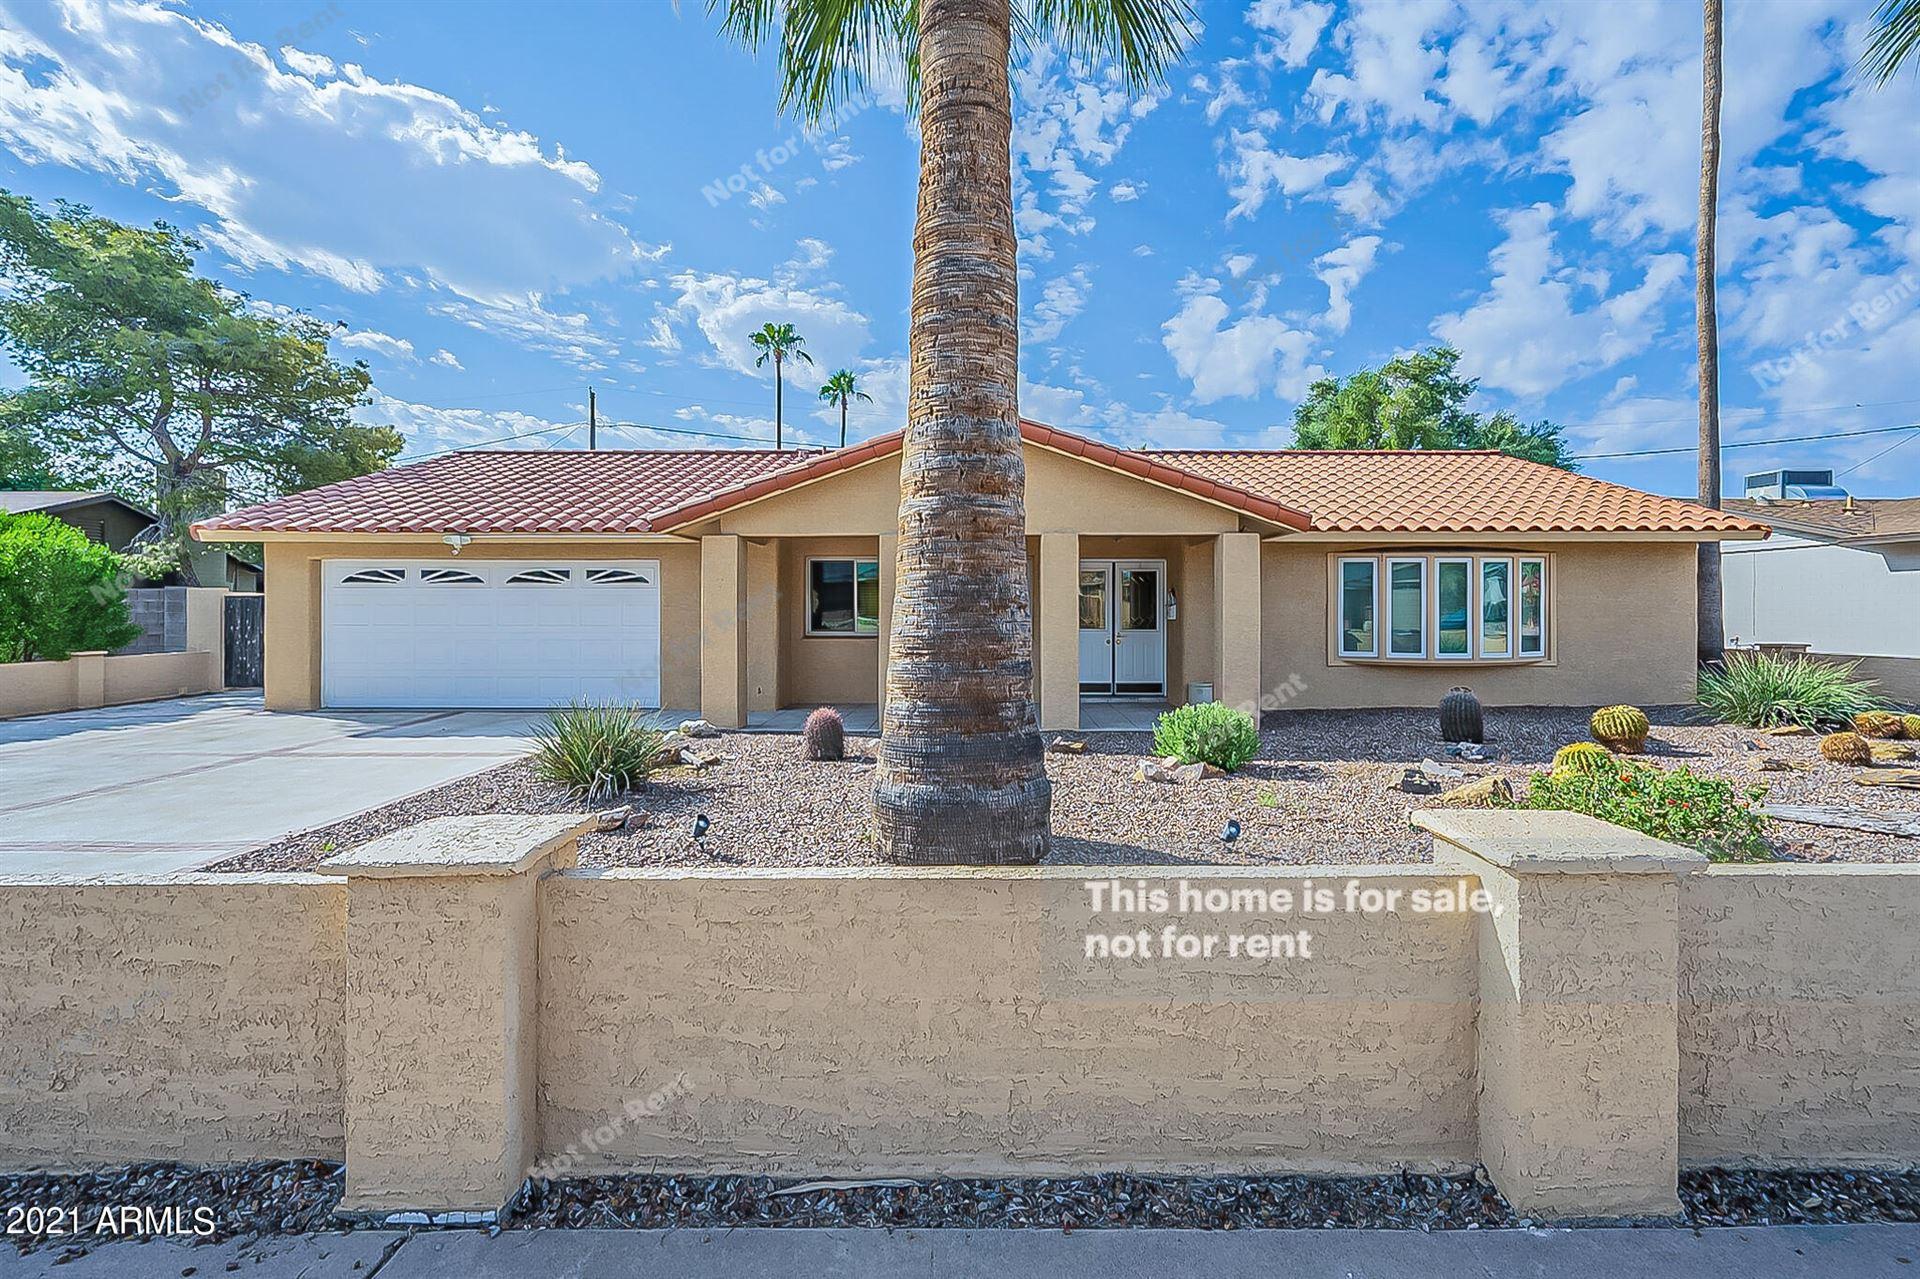 2865 E BERYL Avenue, Phoenix, AZ 85028 - MLS#: 6296344